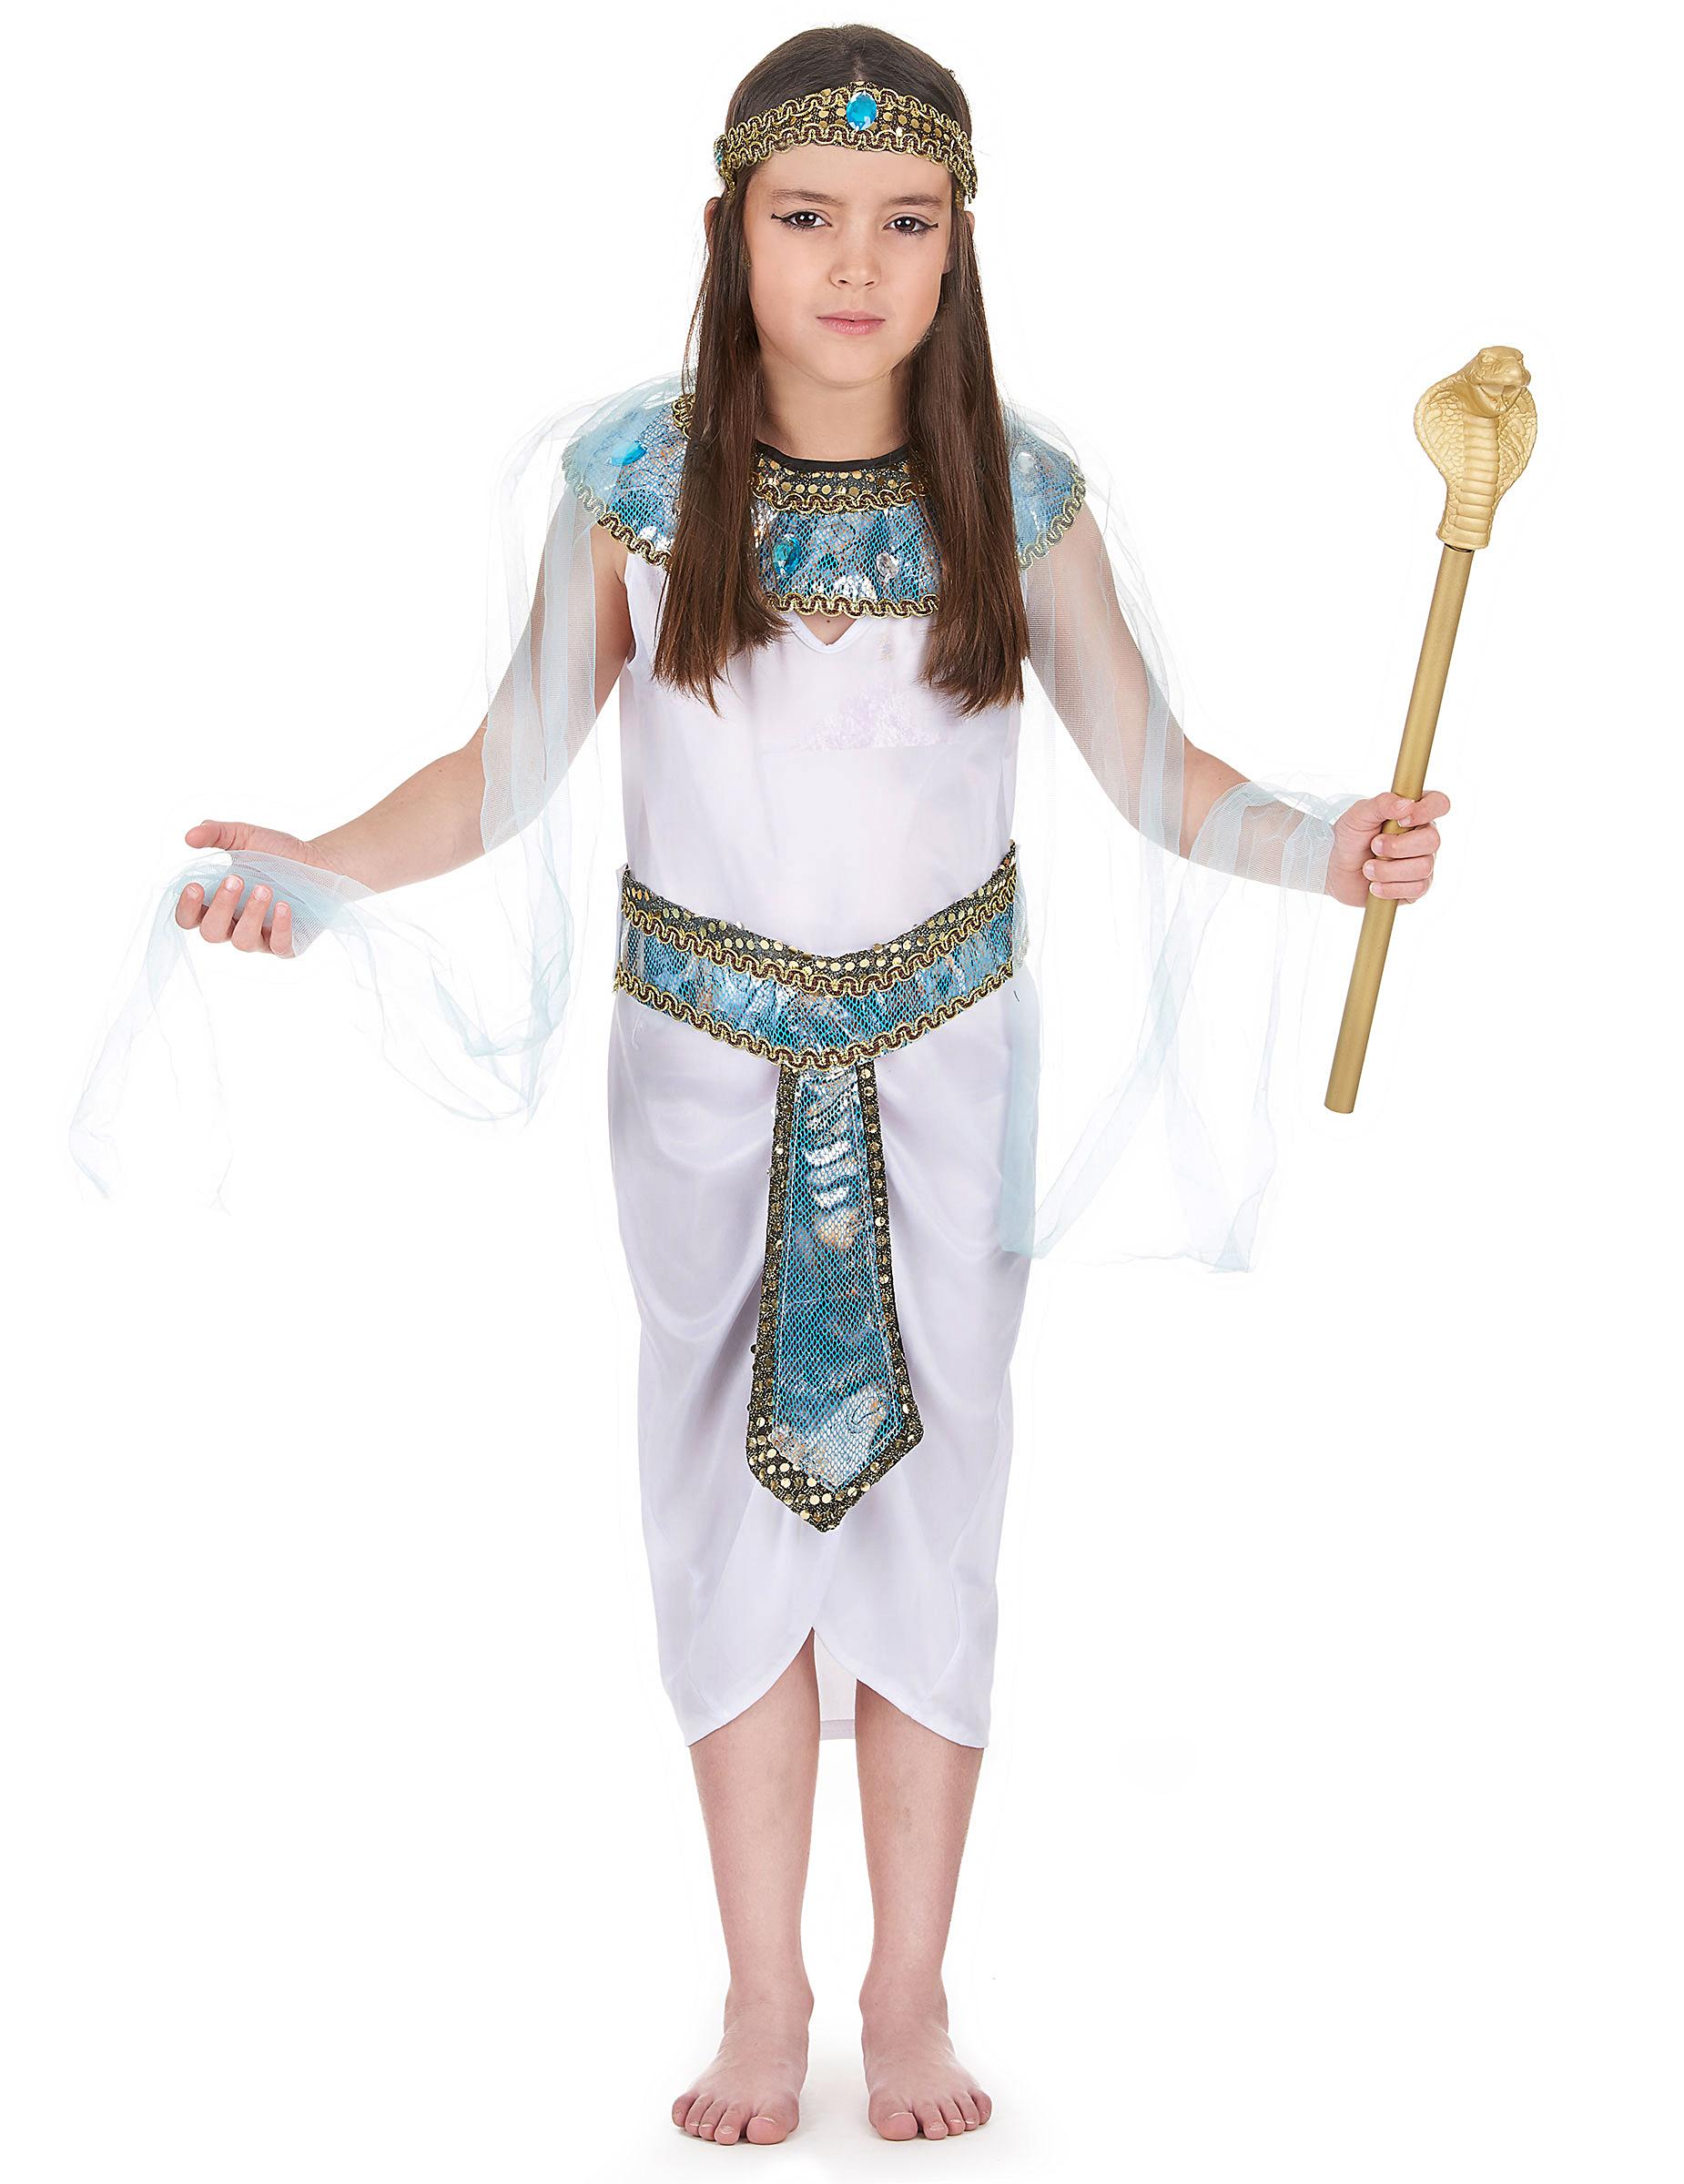 Costumi di Carnevale per ragazze di tutte le età - Vegaoo.it 1fa87e8e34b